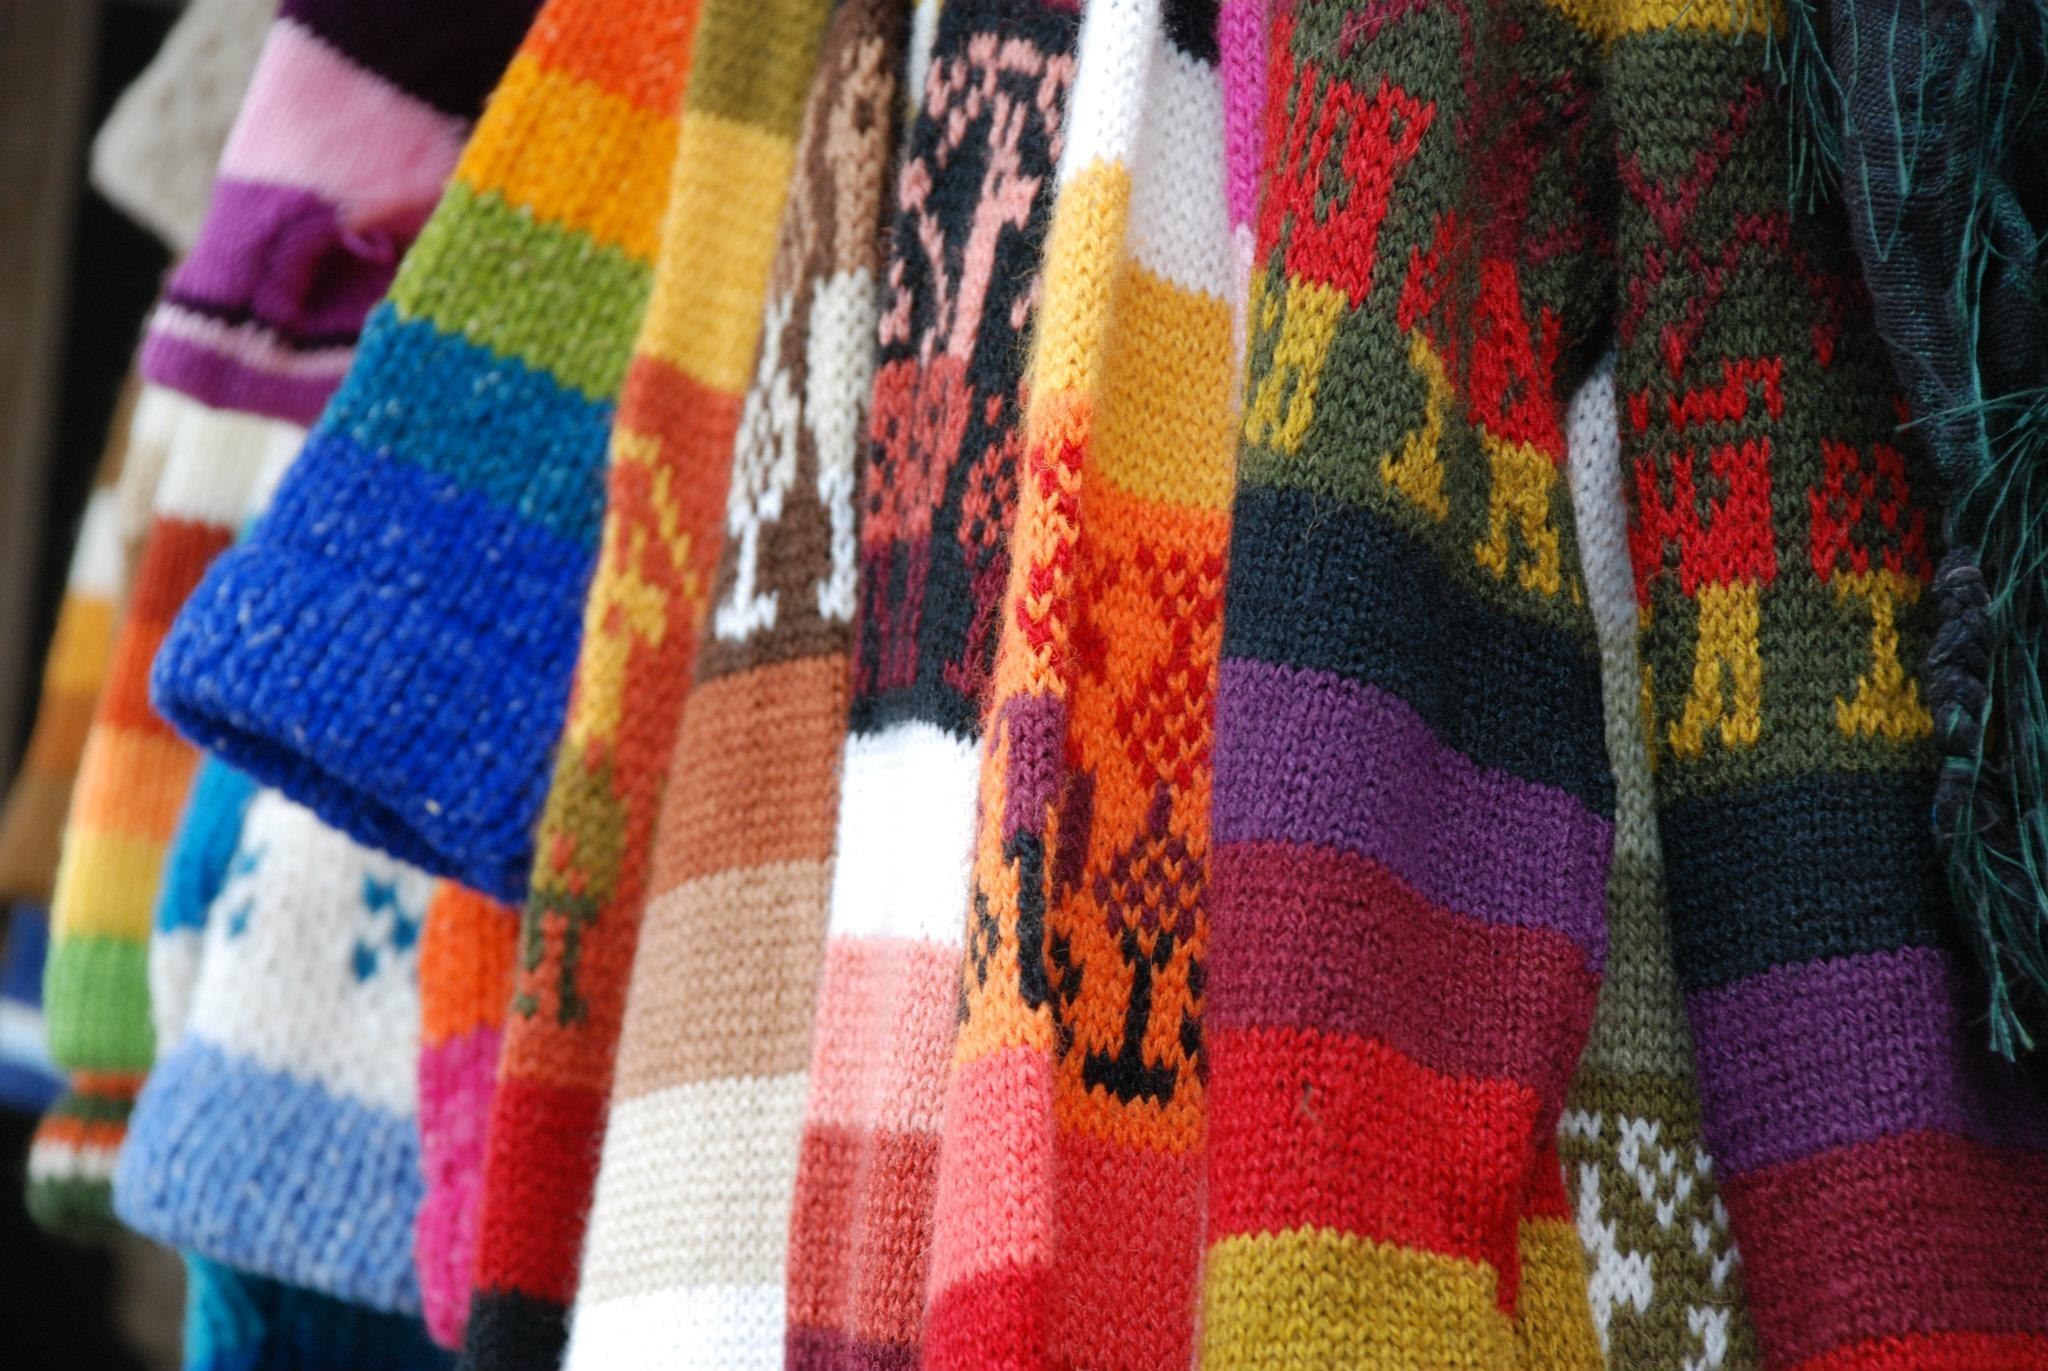 Kostenlose foto : Muster, Farbe, Mode, Kleidung, Wolle, Schal ...